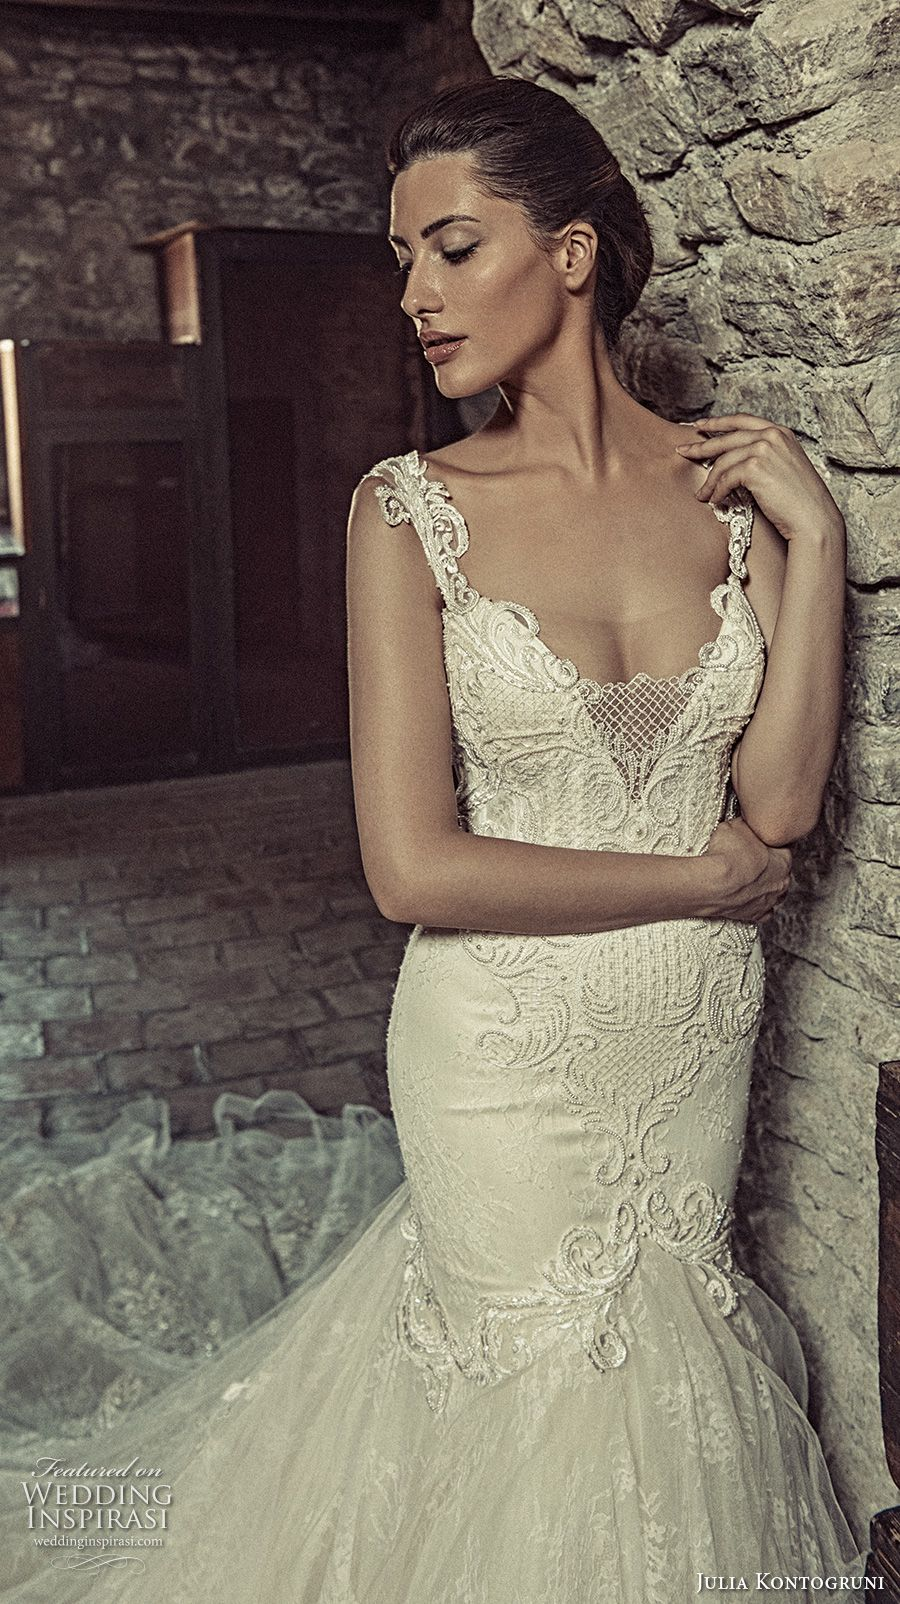 Elegant fitted wedding dresses  Julia Kontogruni  Wedding Dresses  Bodice Wedding dress and